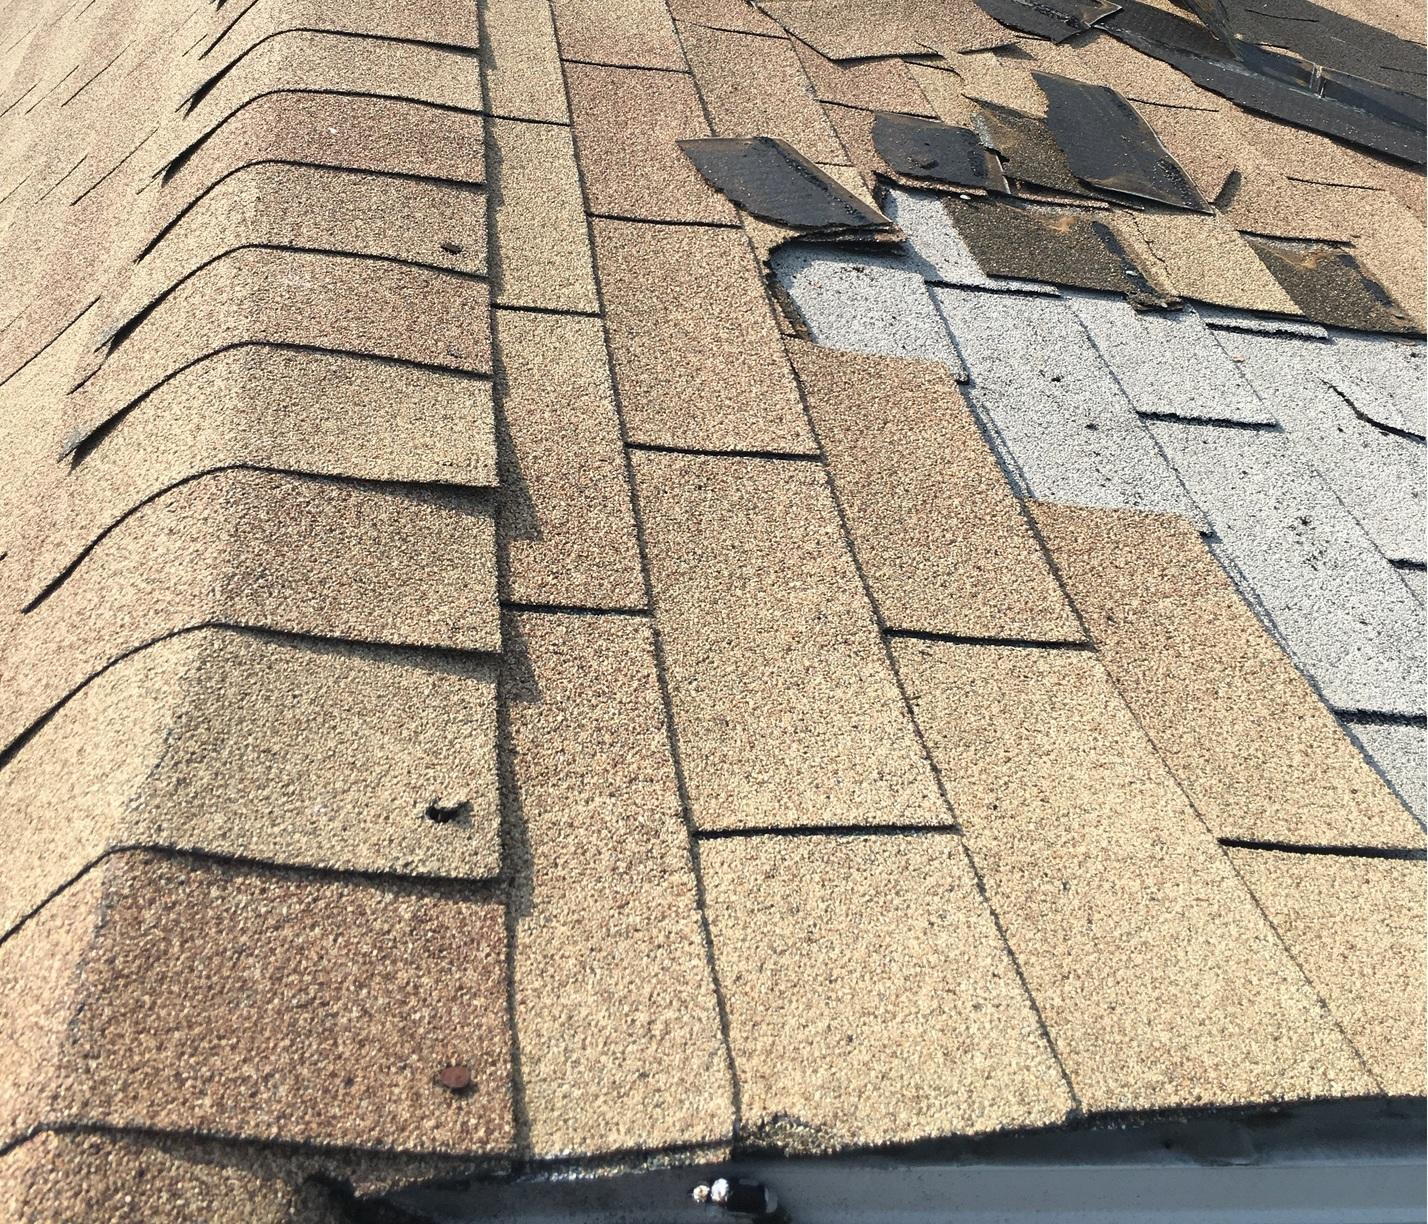 Roof Repair Preparation For Solar Panel Install In